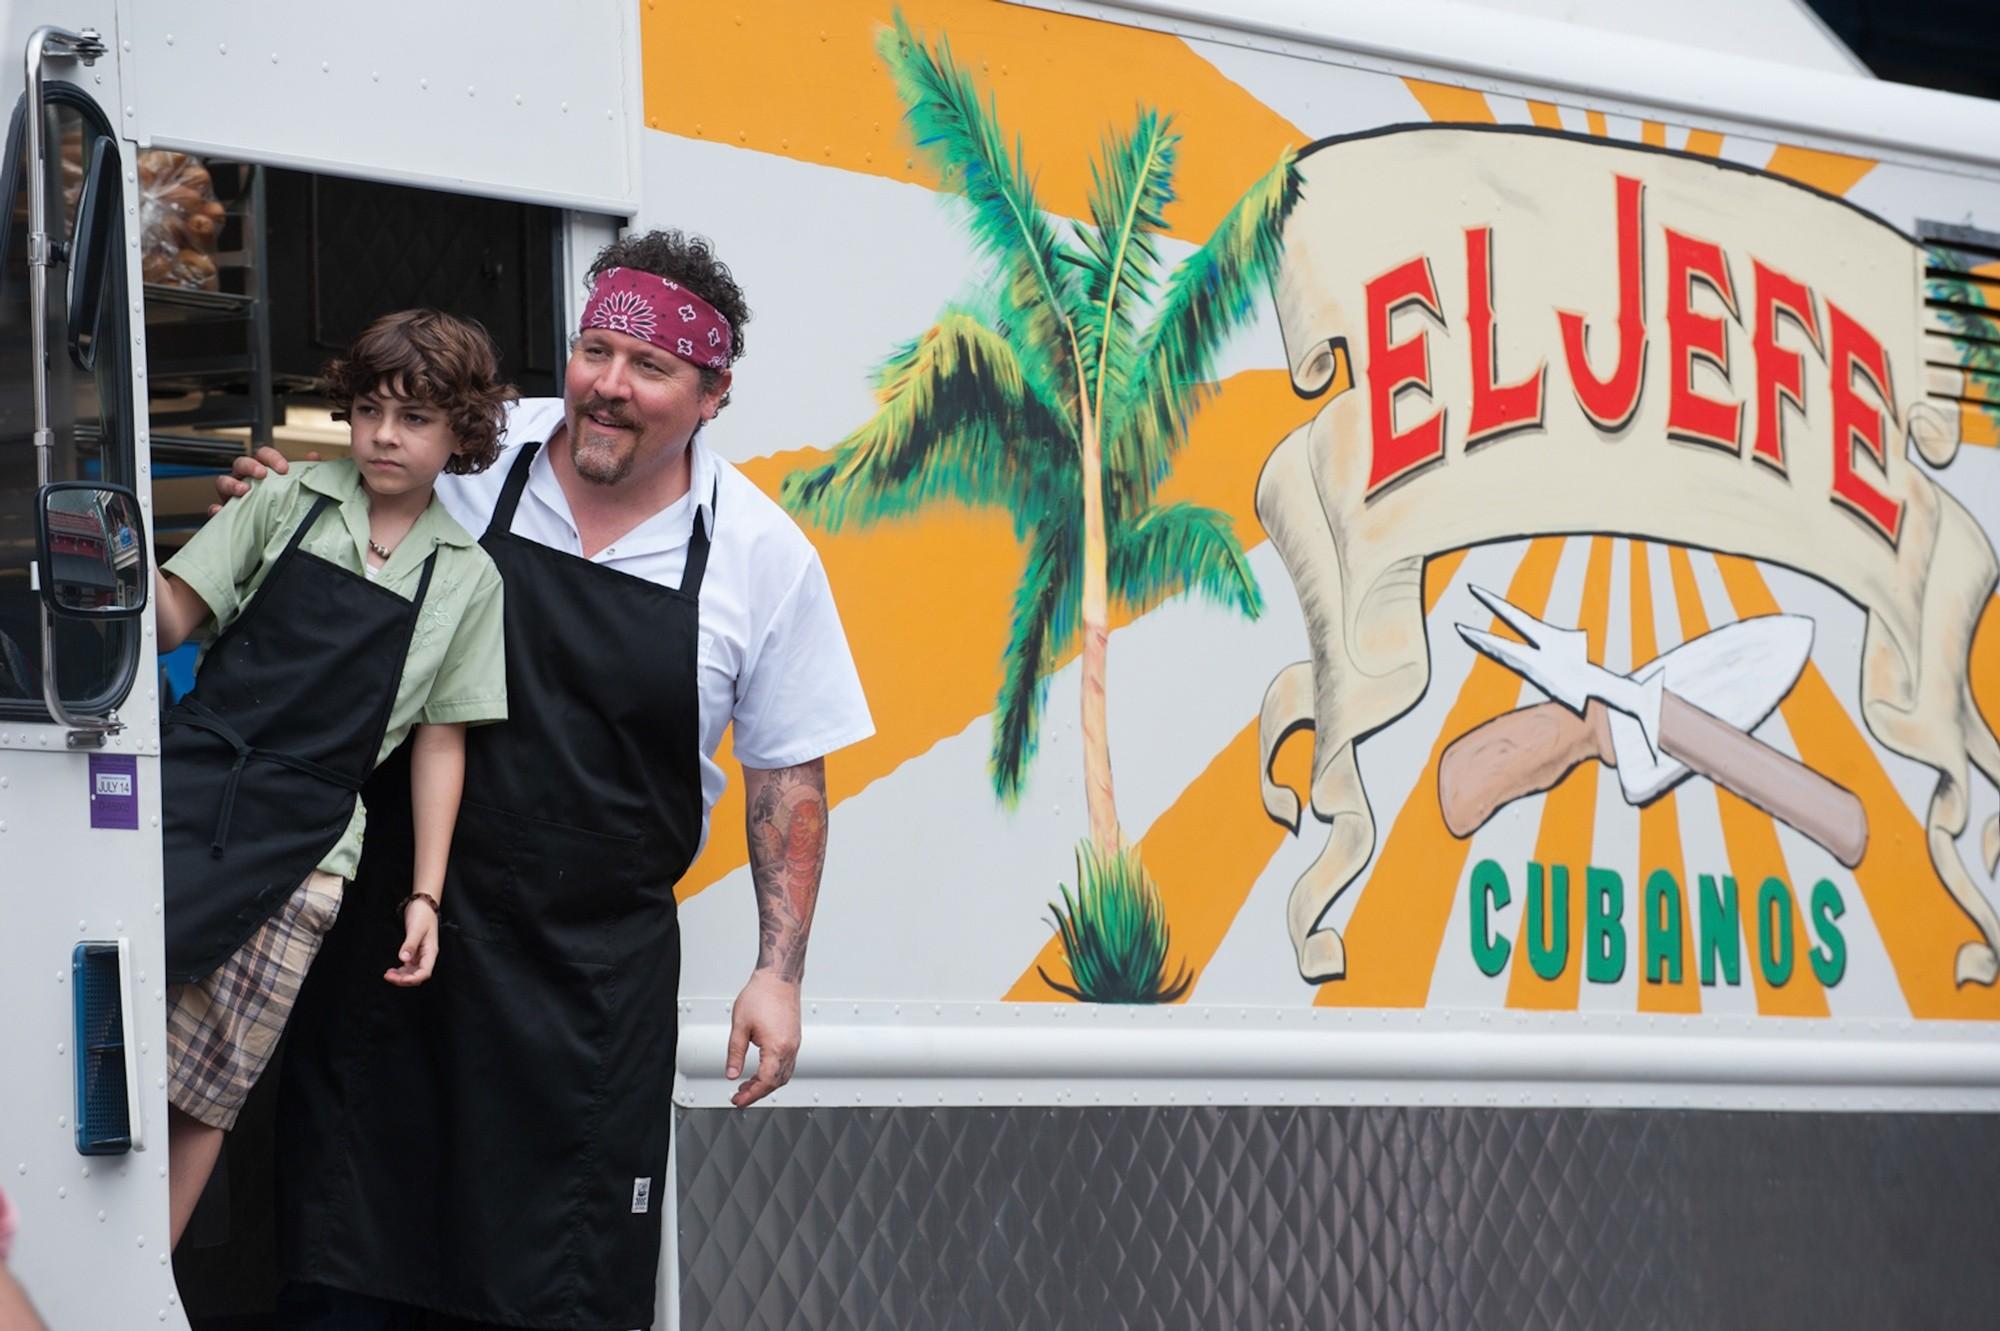 Jon Favreau as Chef in his food truck